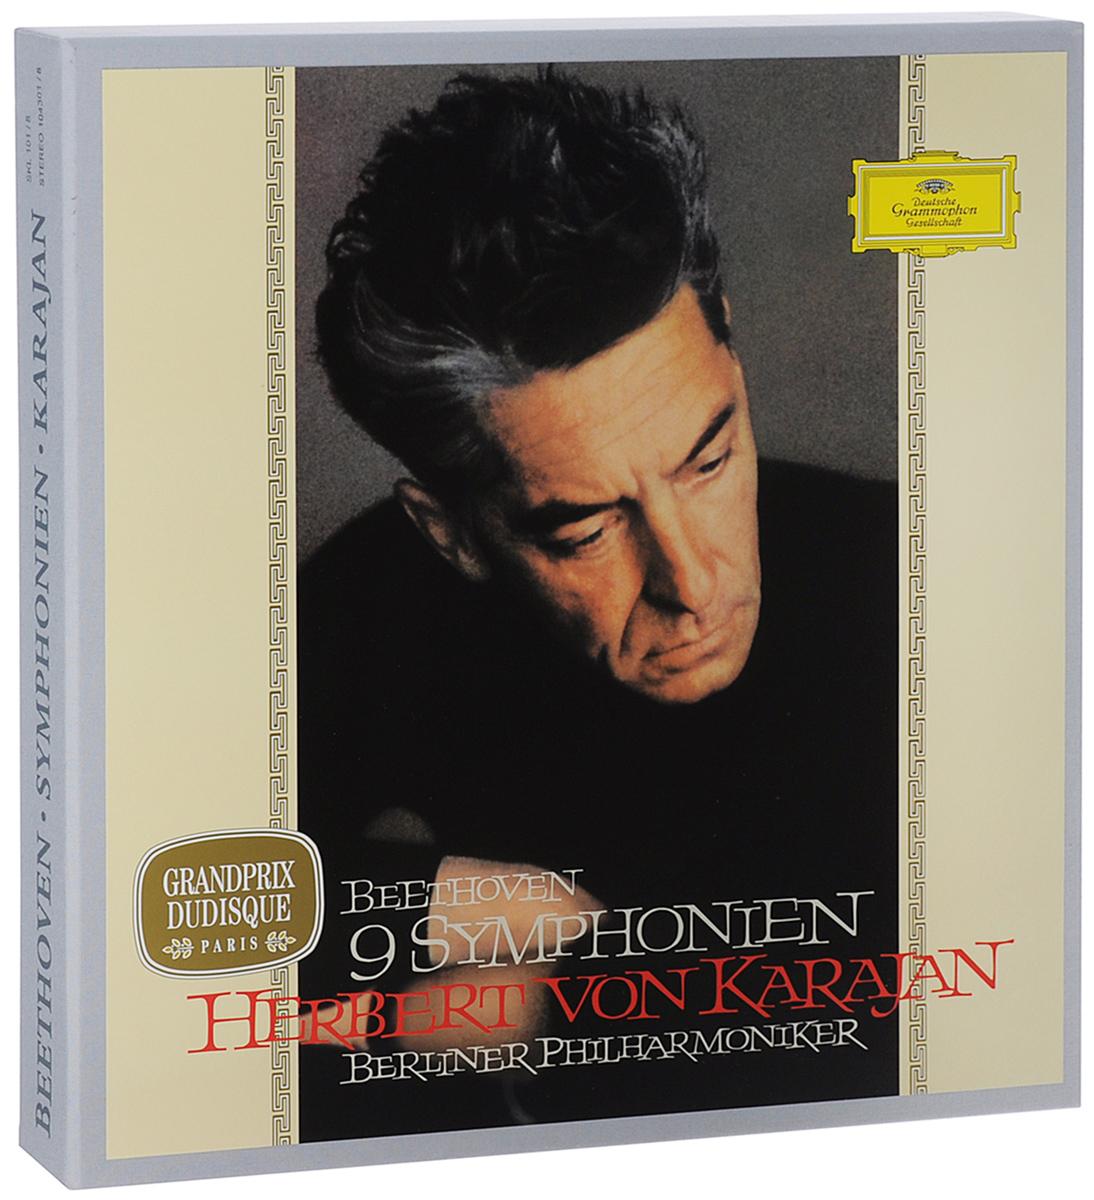 Herbert von Karajan. Beethoven. 9 Symphonien. Limited Edition (8 LP)